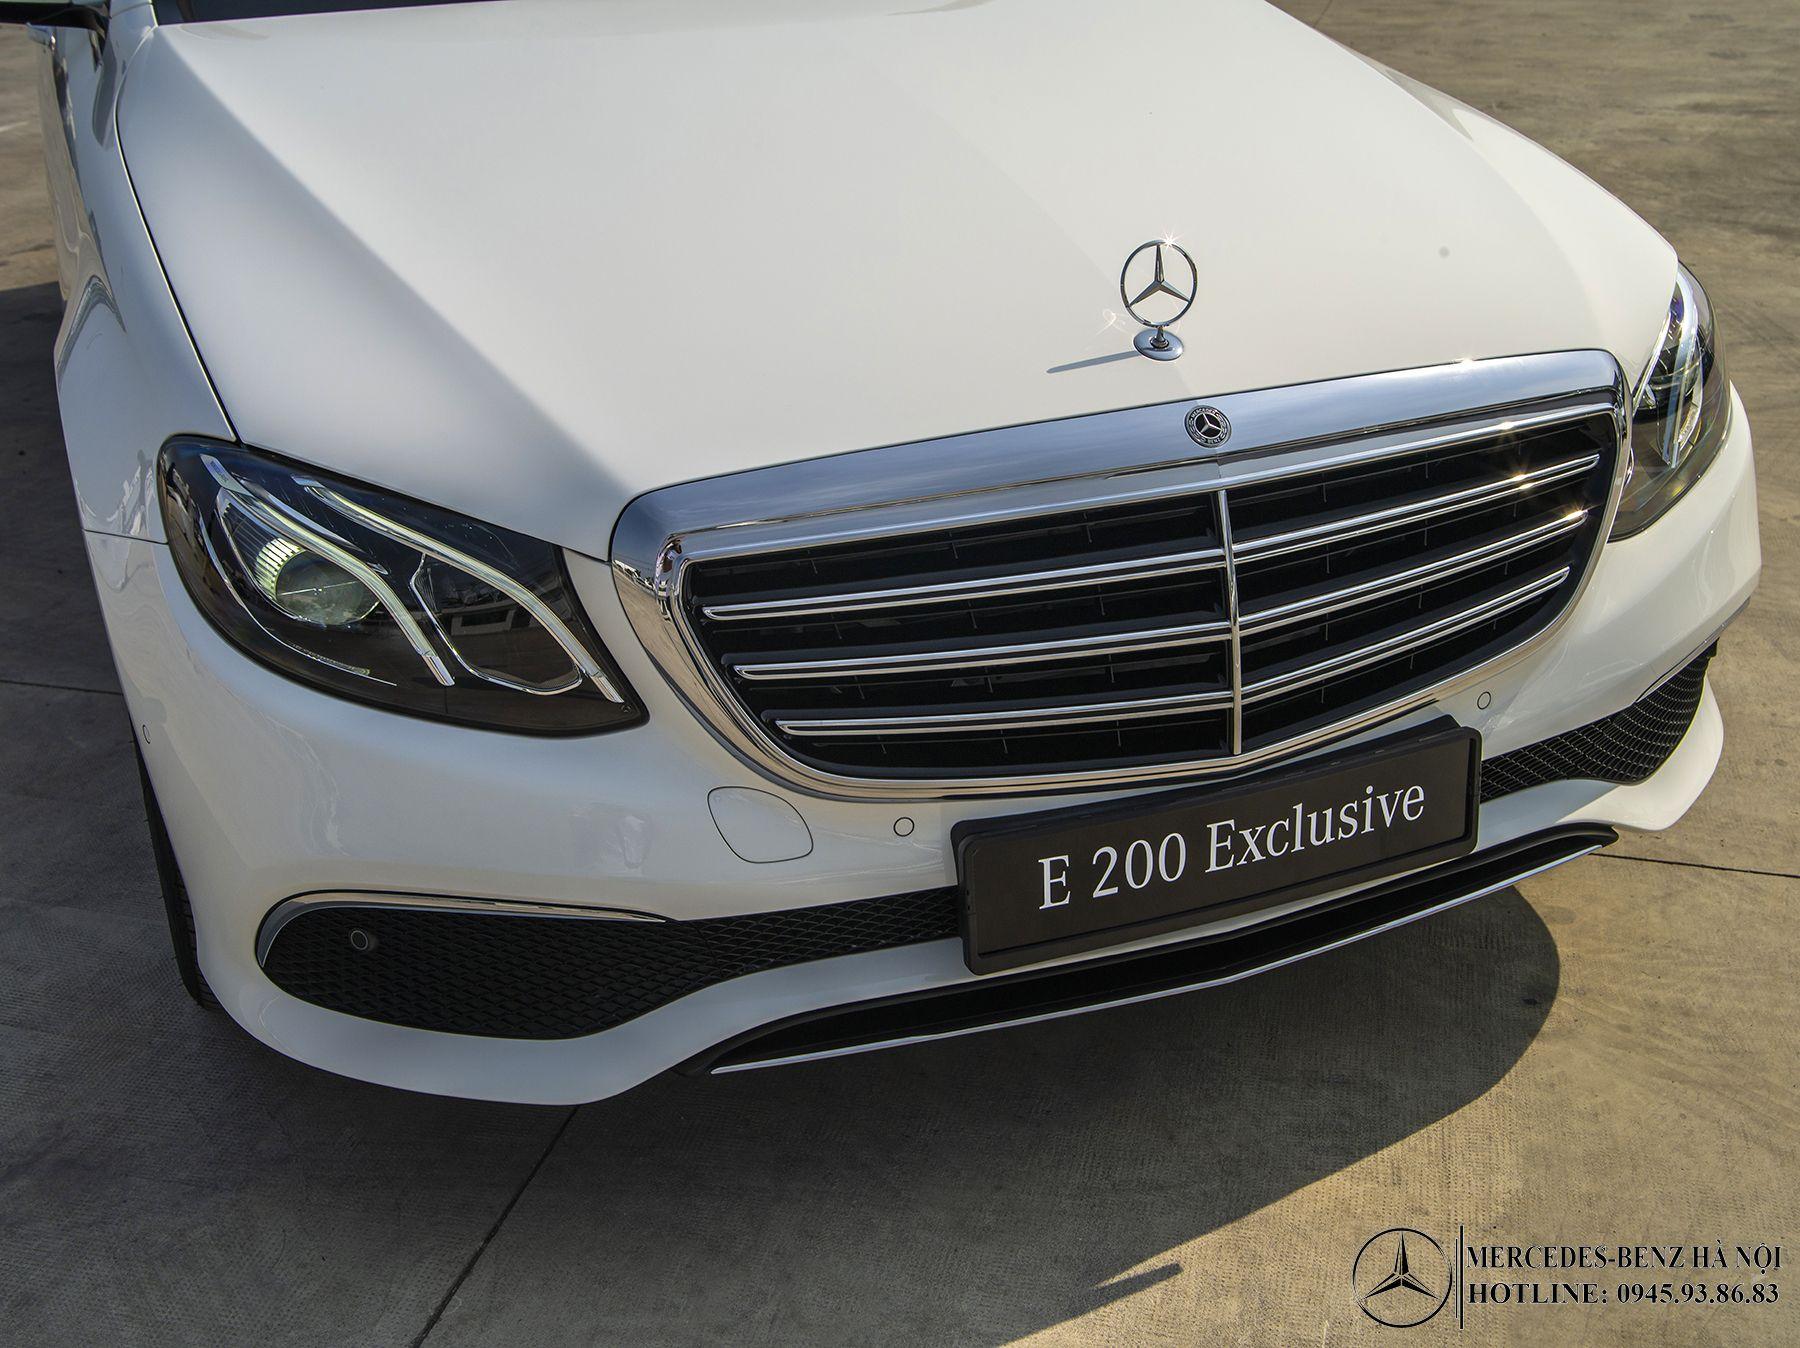 dau-xe-mercedes-benz-e-200-exclusive (3)-mercedeshanoi-com-vn